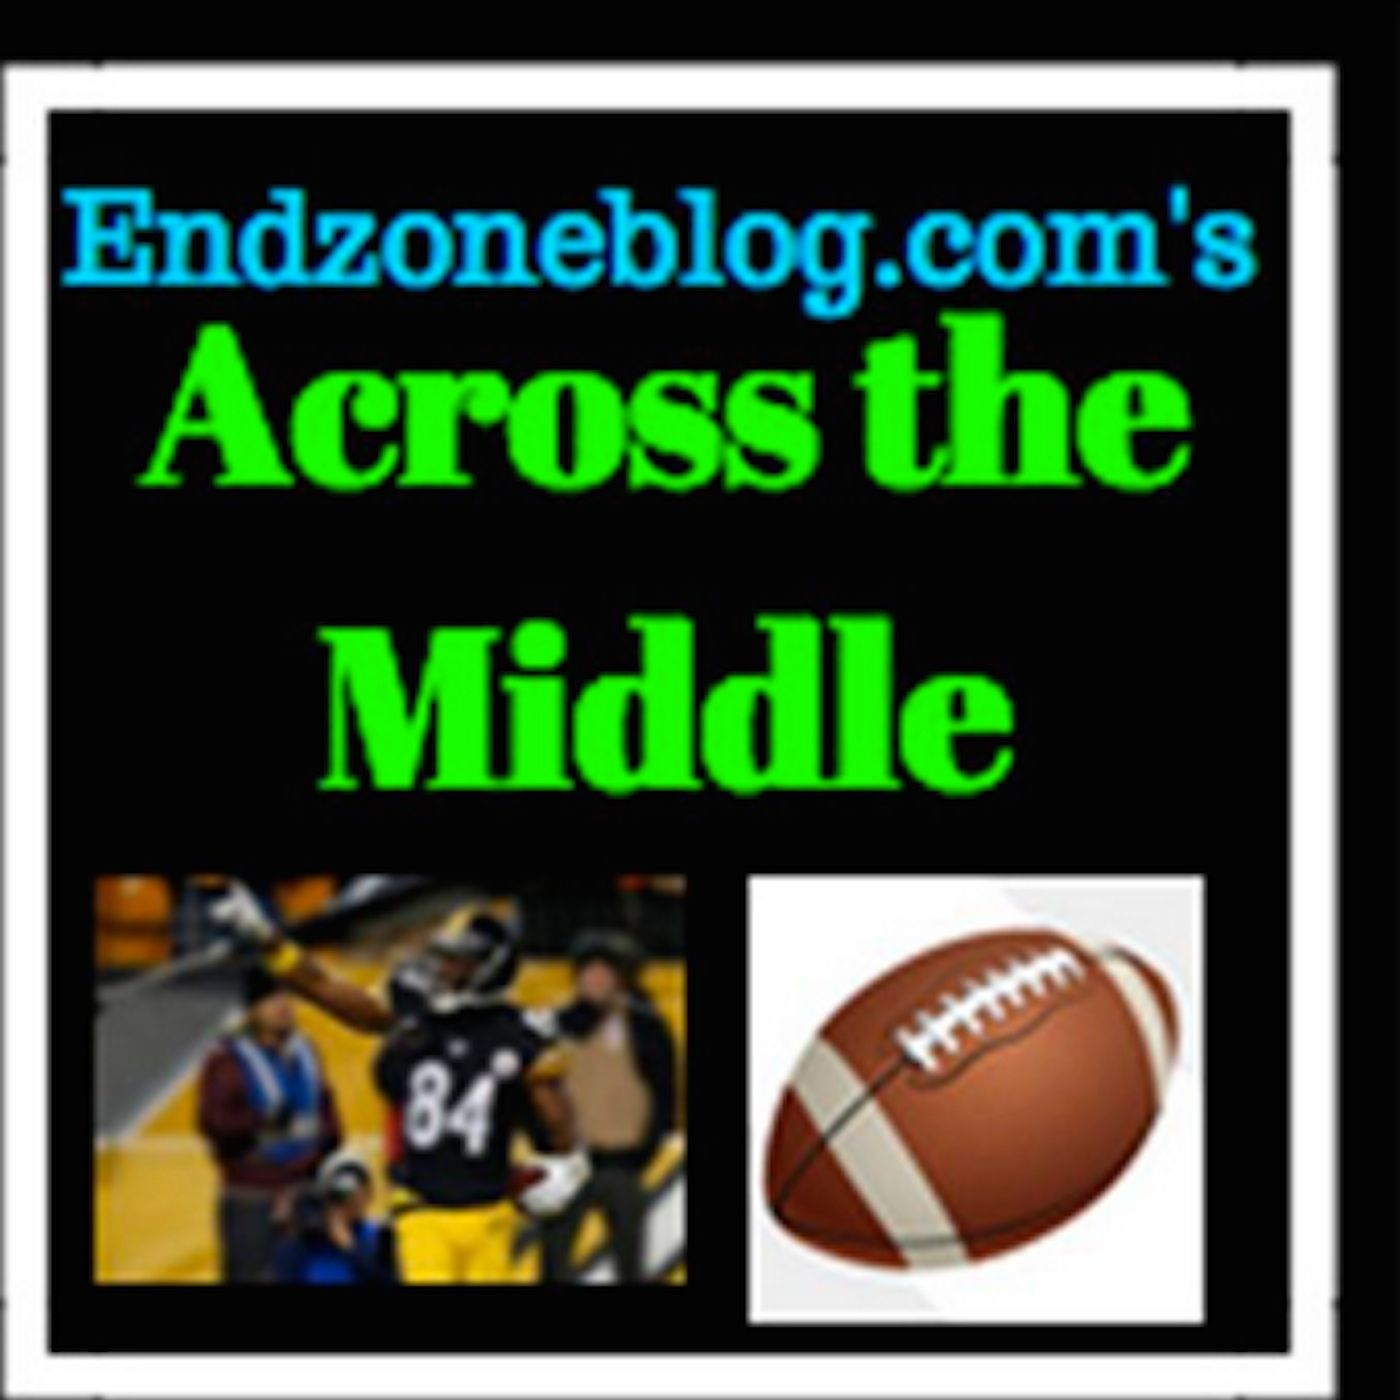 Endzoneblog.com's Across the Middle Show